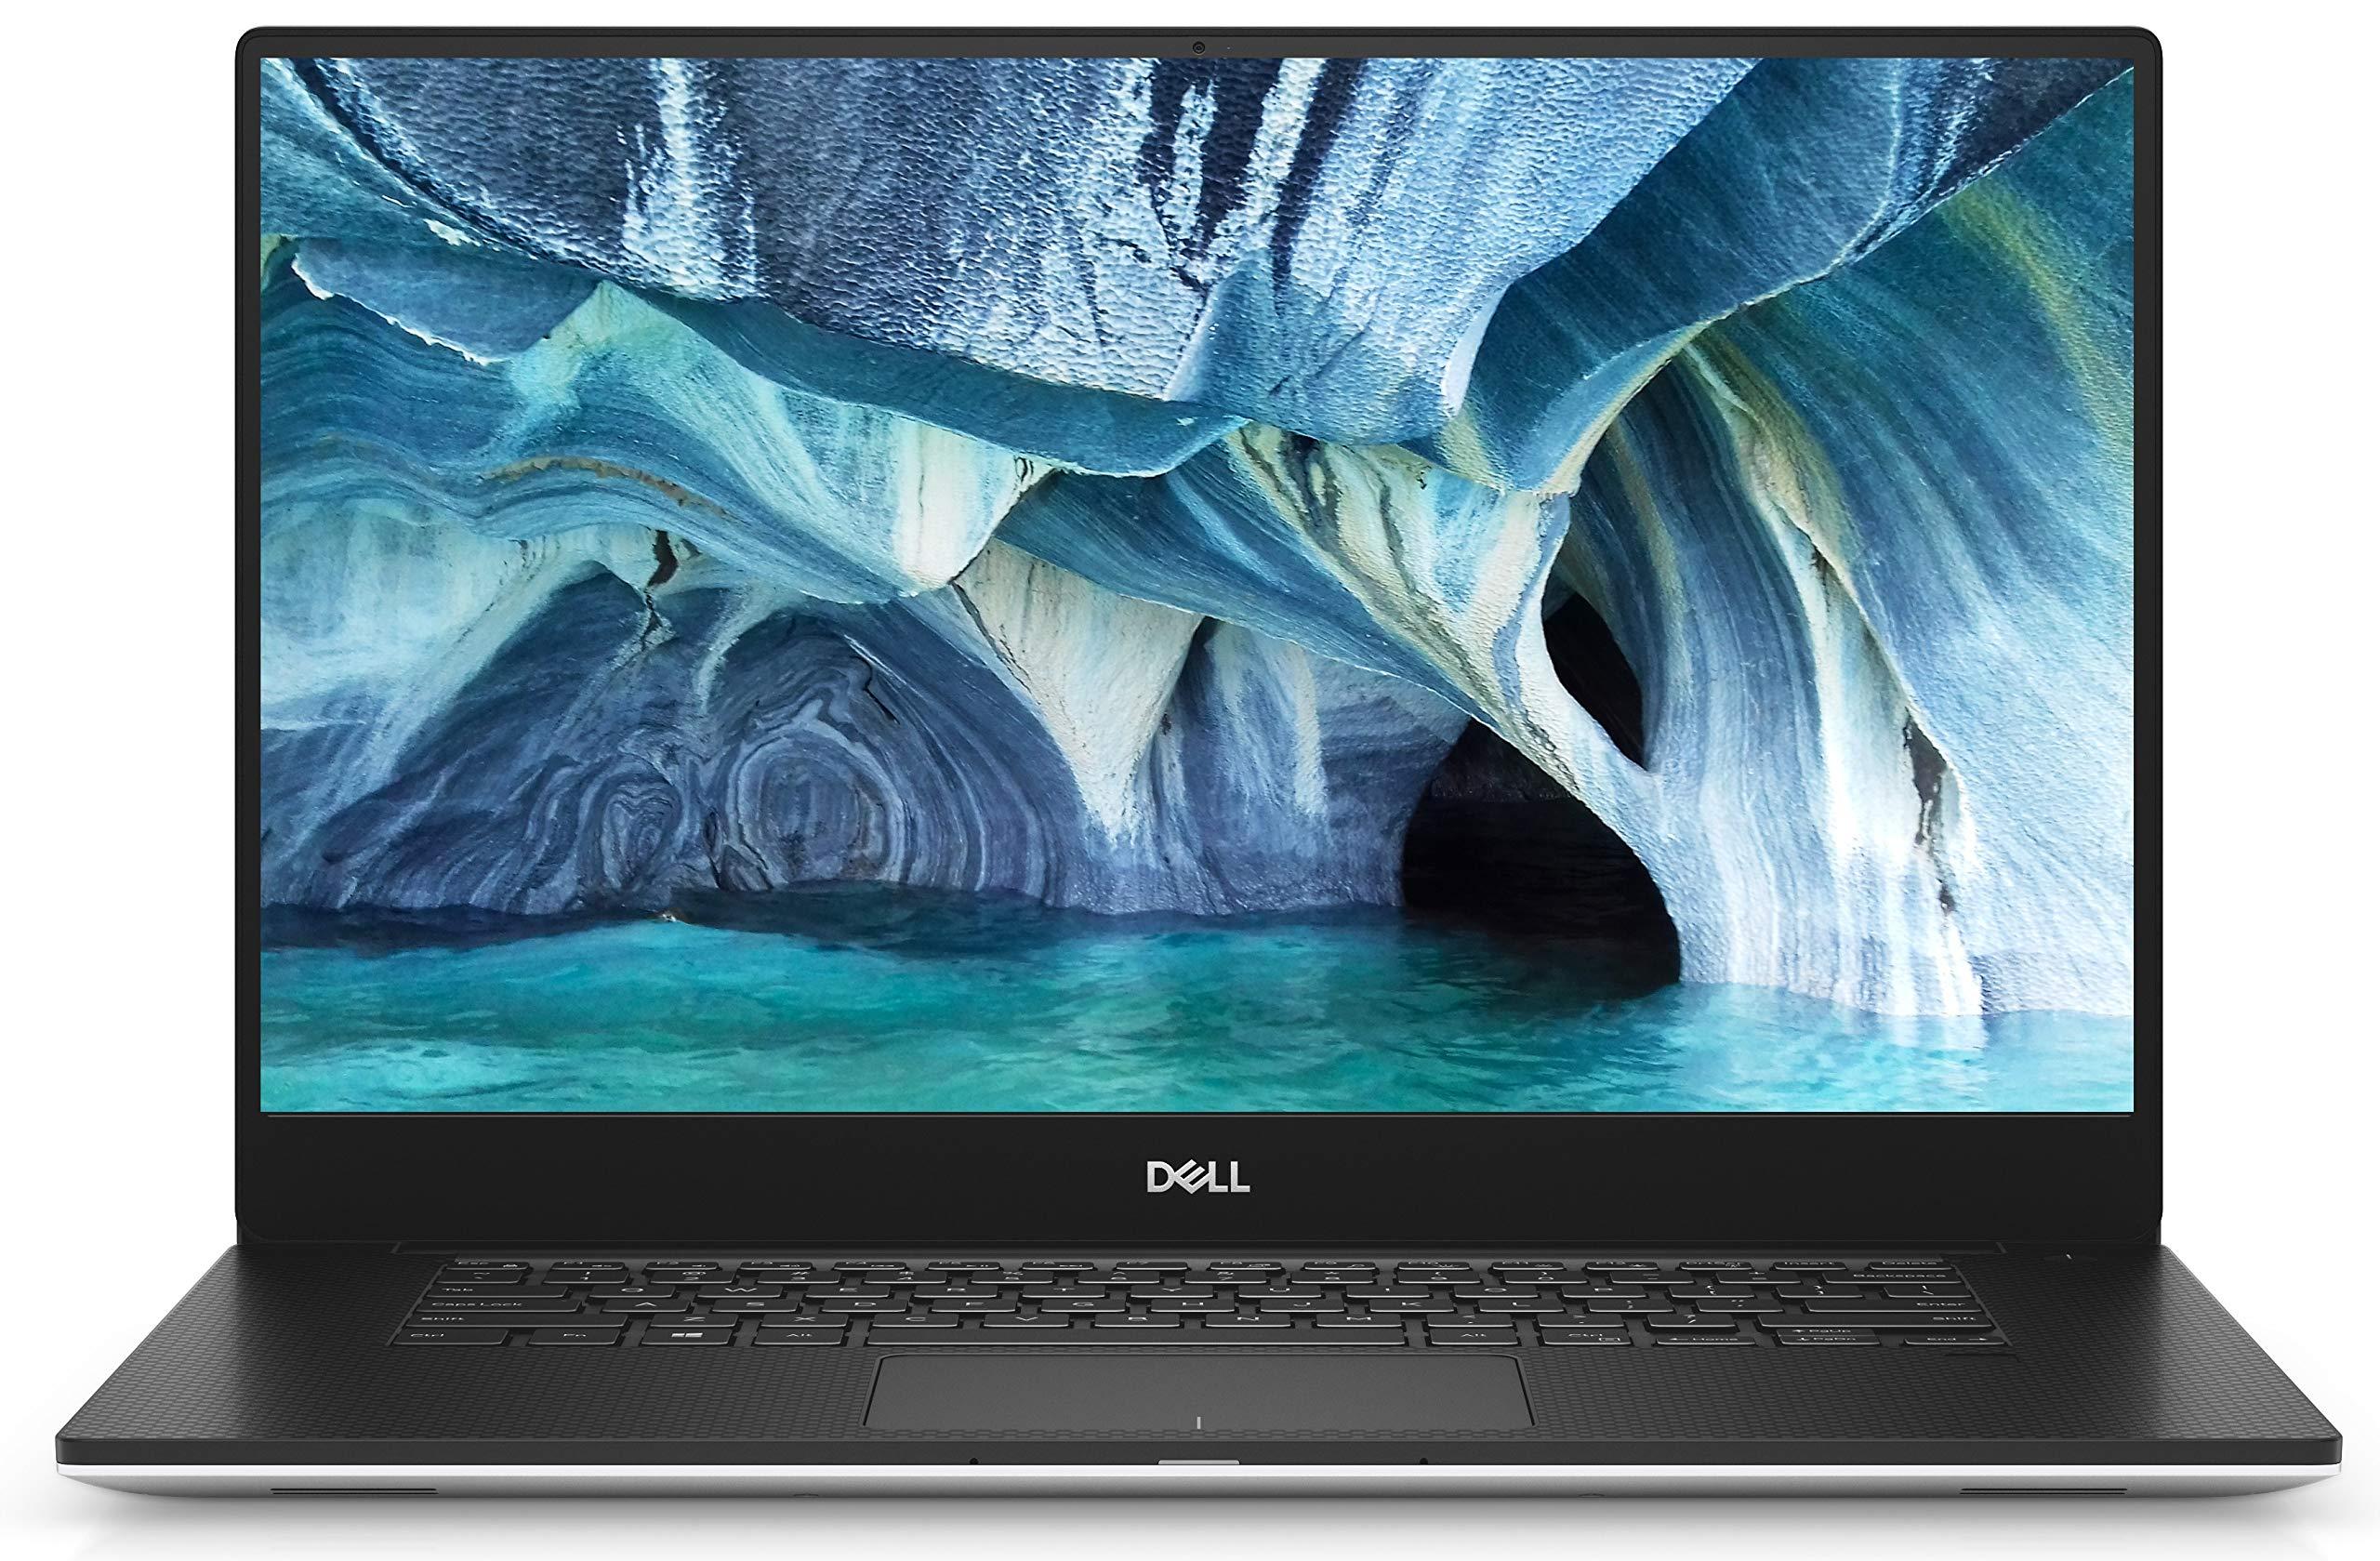 Description: Amazon.com: Dell XPS 15 7590 Laptop 15.6 inch, 4K UHD OLED InfinityEdge,  9th Gen Intel Core i7-9750H, NVIDIA GeForce GTX 1650 4GB GDDR5, 256GB SSD,  16GB RAM, Windows 10 Home, XPS7590-7572SLV-PUS, 15-15.99